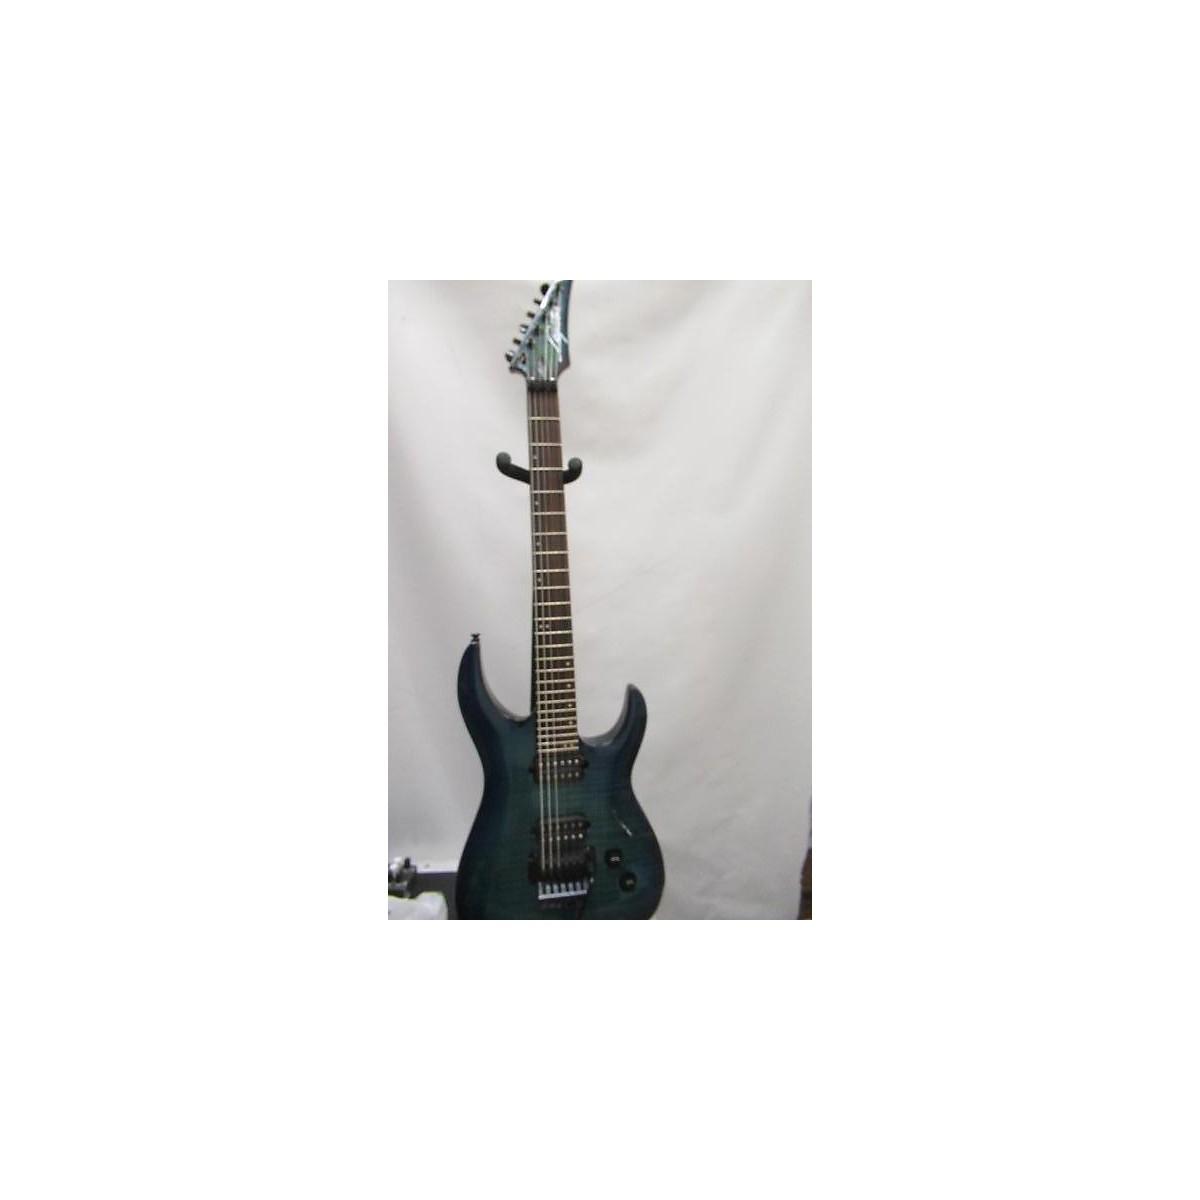 Legator Ninja 350 Pro Solid Body Electric Guitar